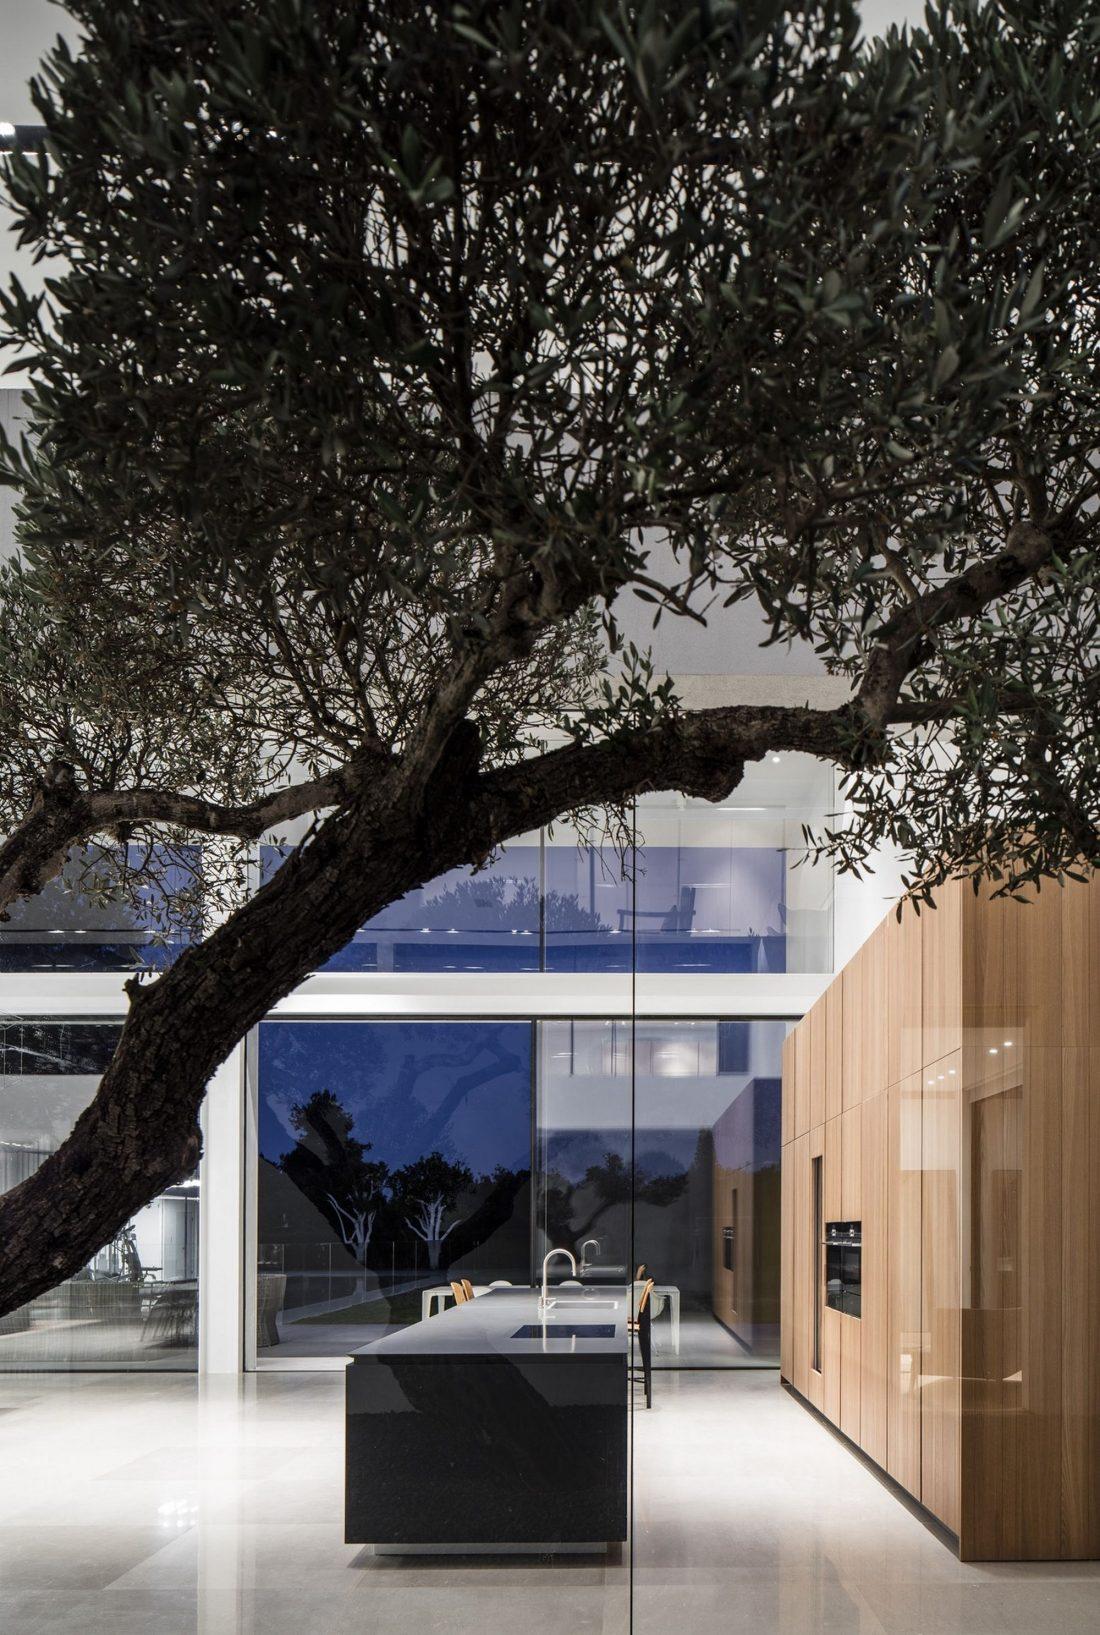 700-kvadratnyh-metrov-sveta-f-house-po-proektu-studii-pitsou-kedem-29